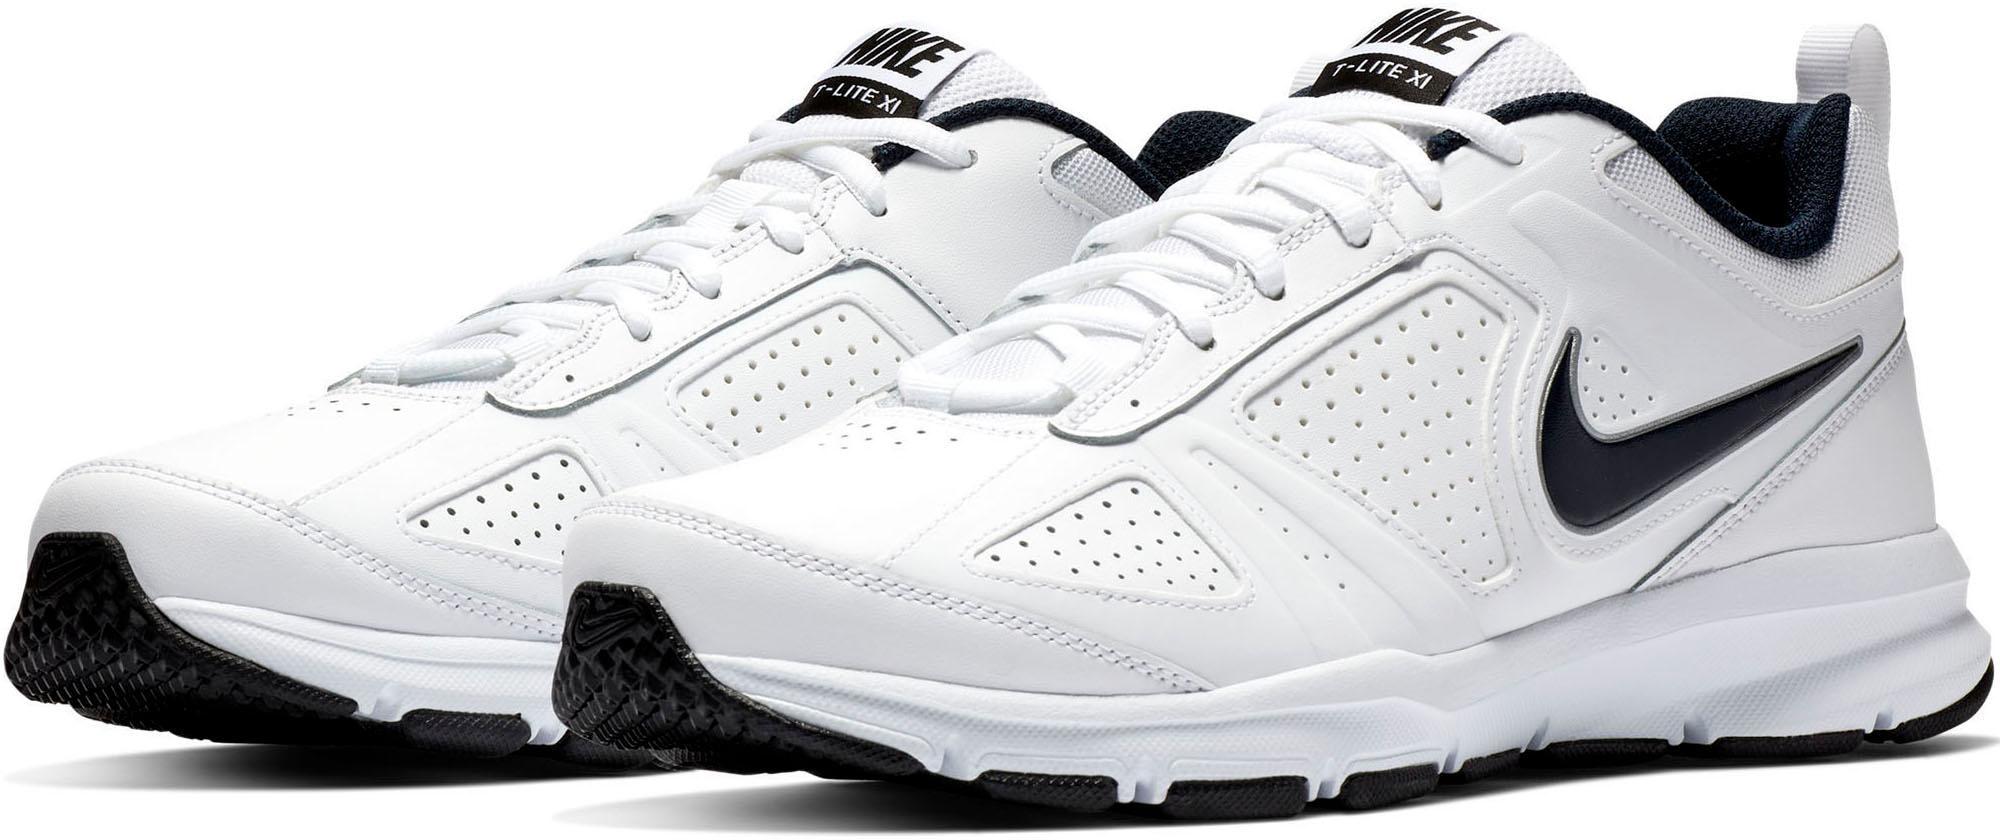 Nike Walkingschuh  ;T-Lite Männer XI für Männer ;T-Lite | imwalking.de da8f97